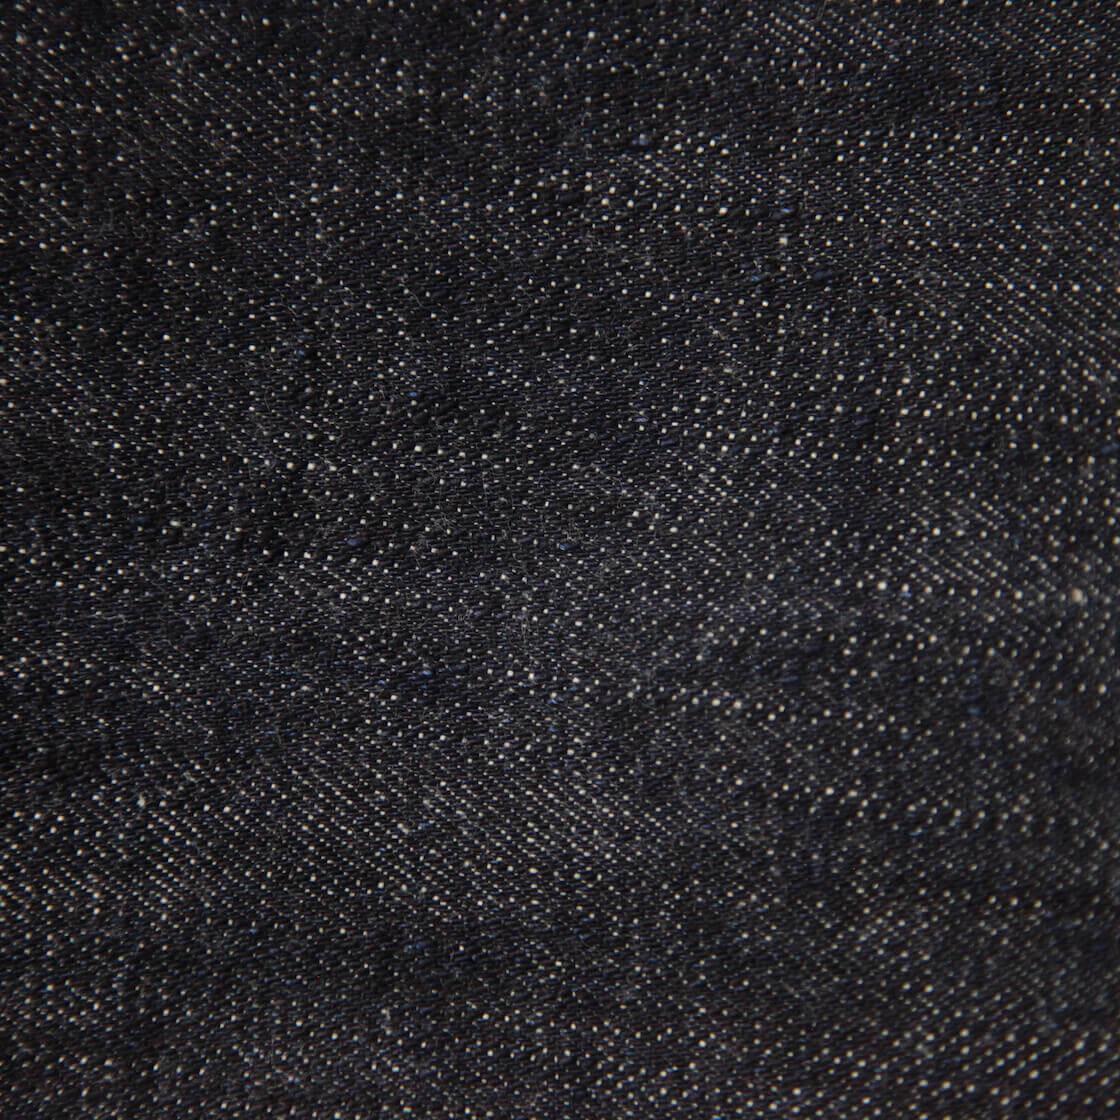 detail image of neppy denim